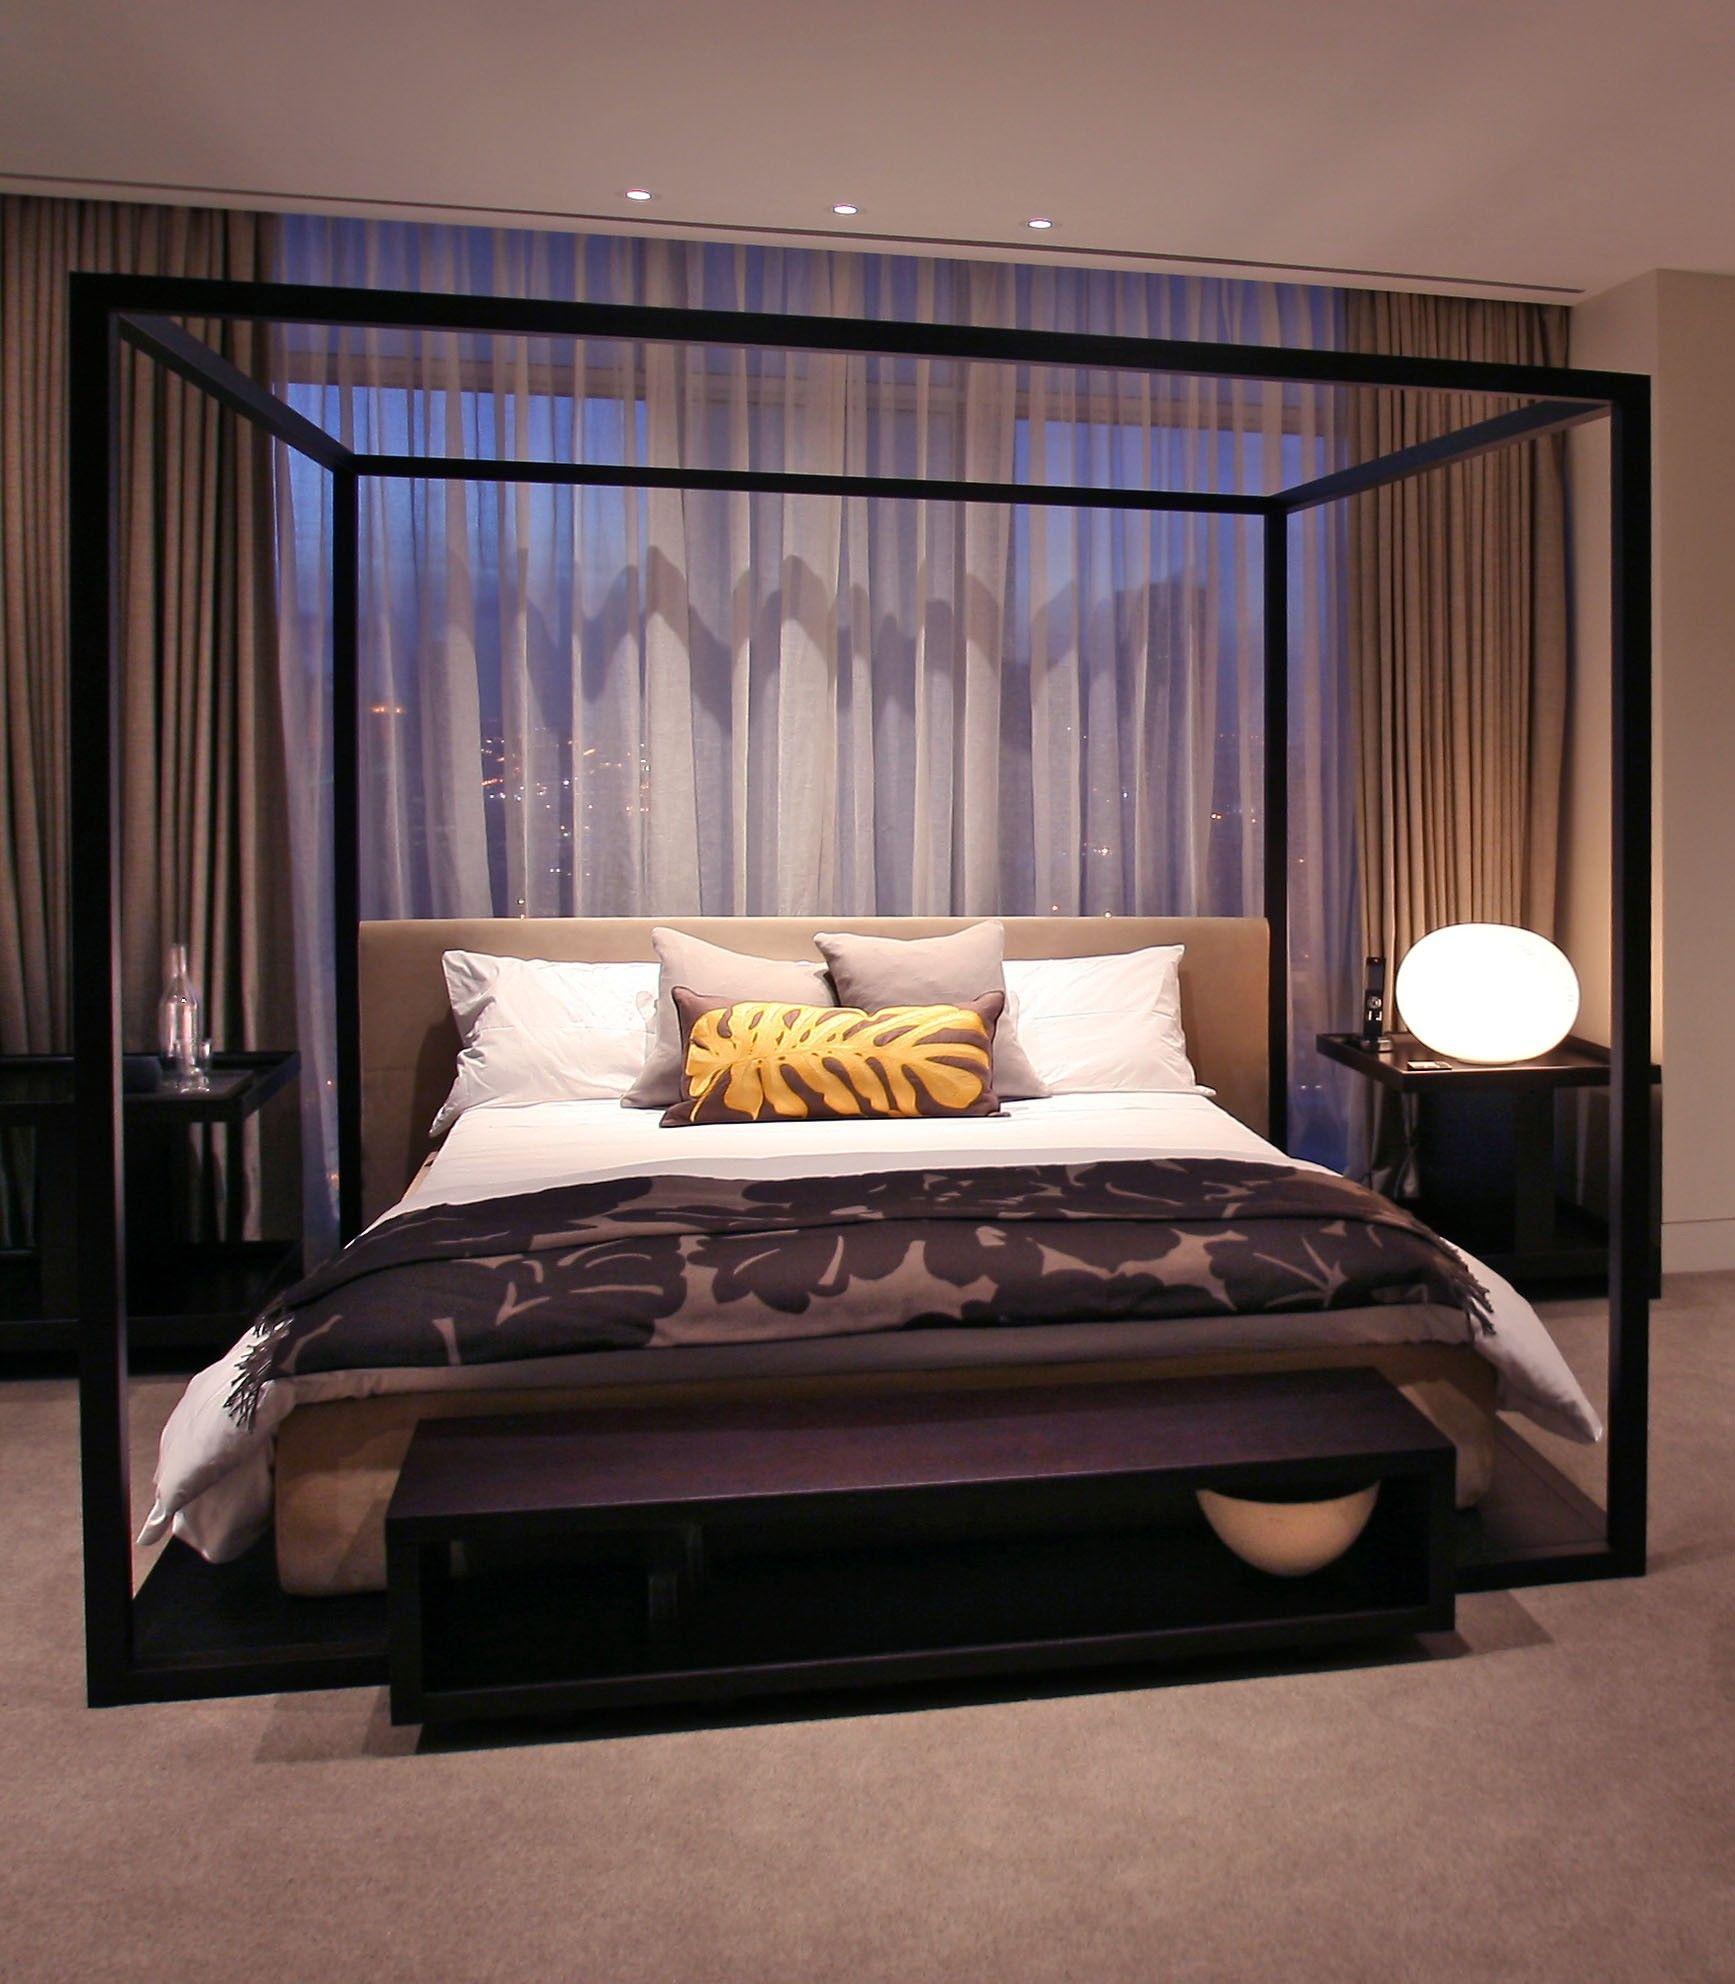 Pin by Alana Medina on Bedroom Canopy bed frame, Modern